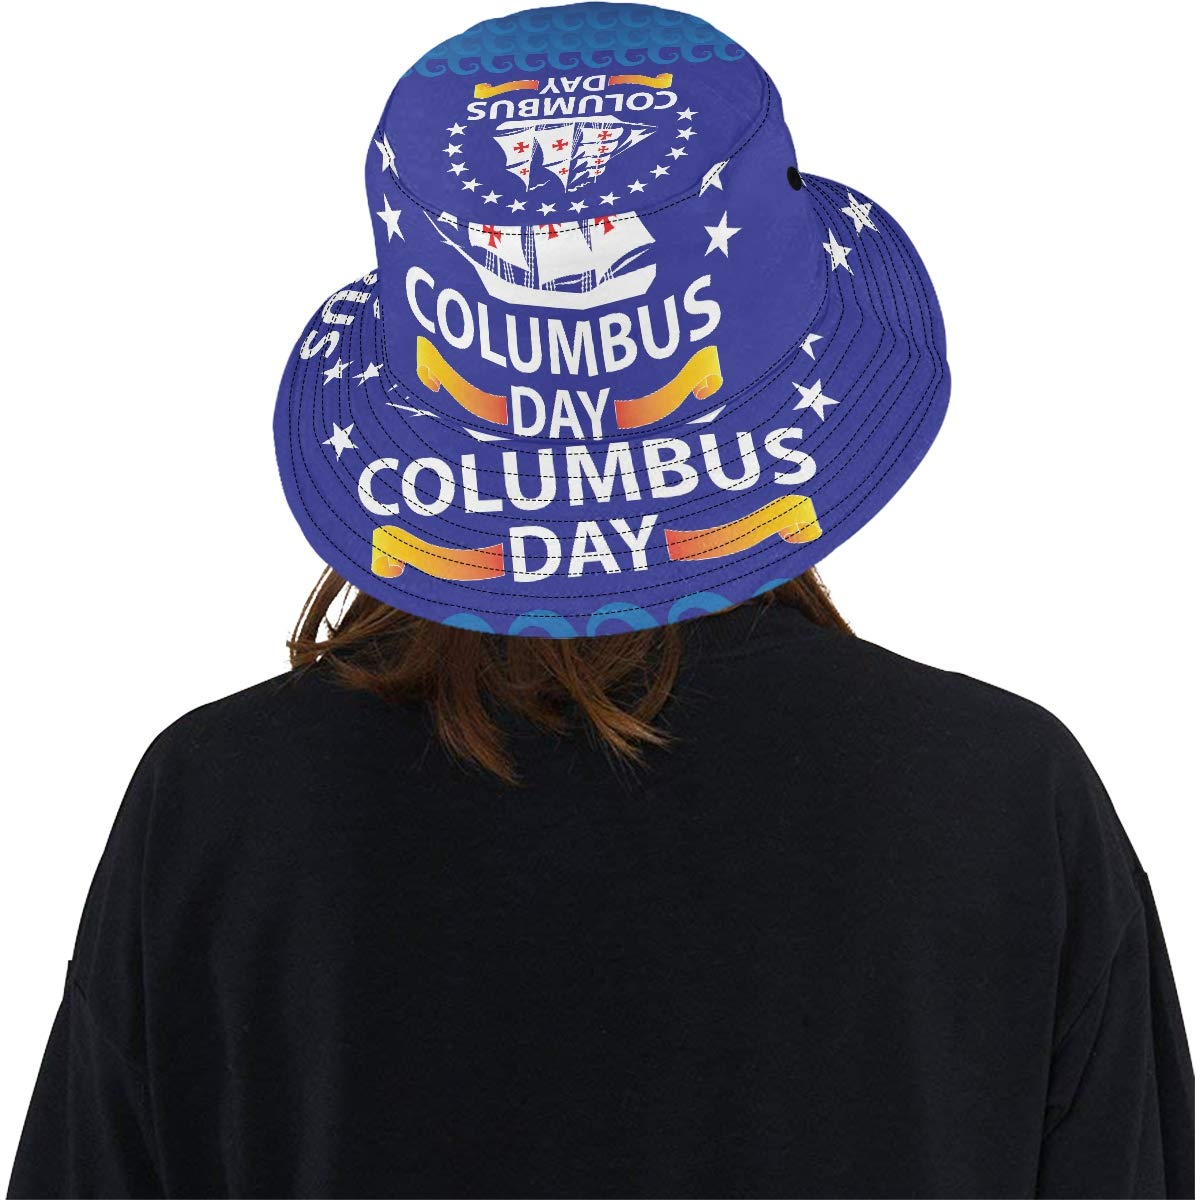 Columbus Day Kids Children Short Sleeve Shirt Tops